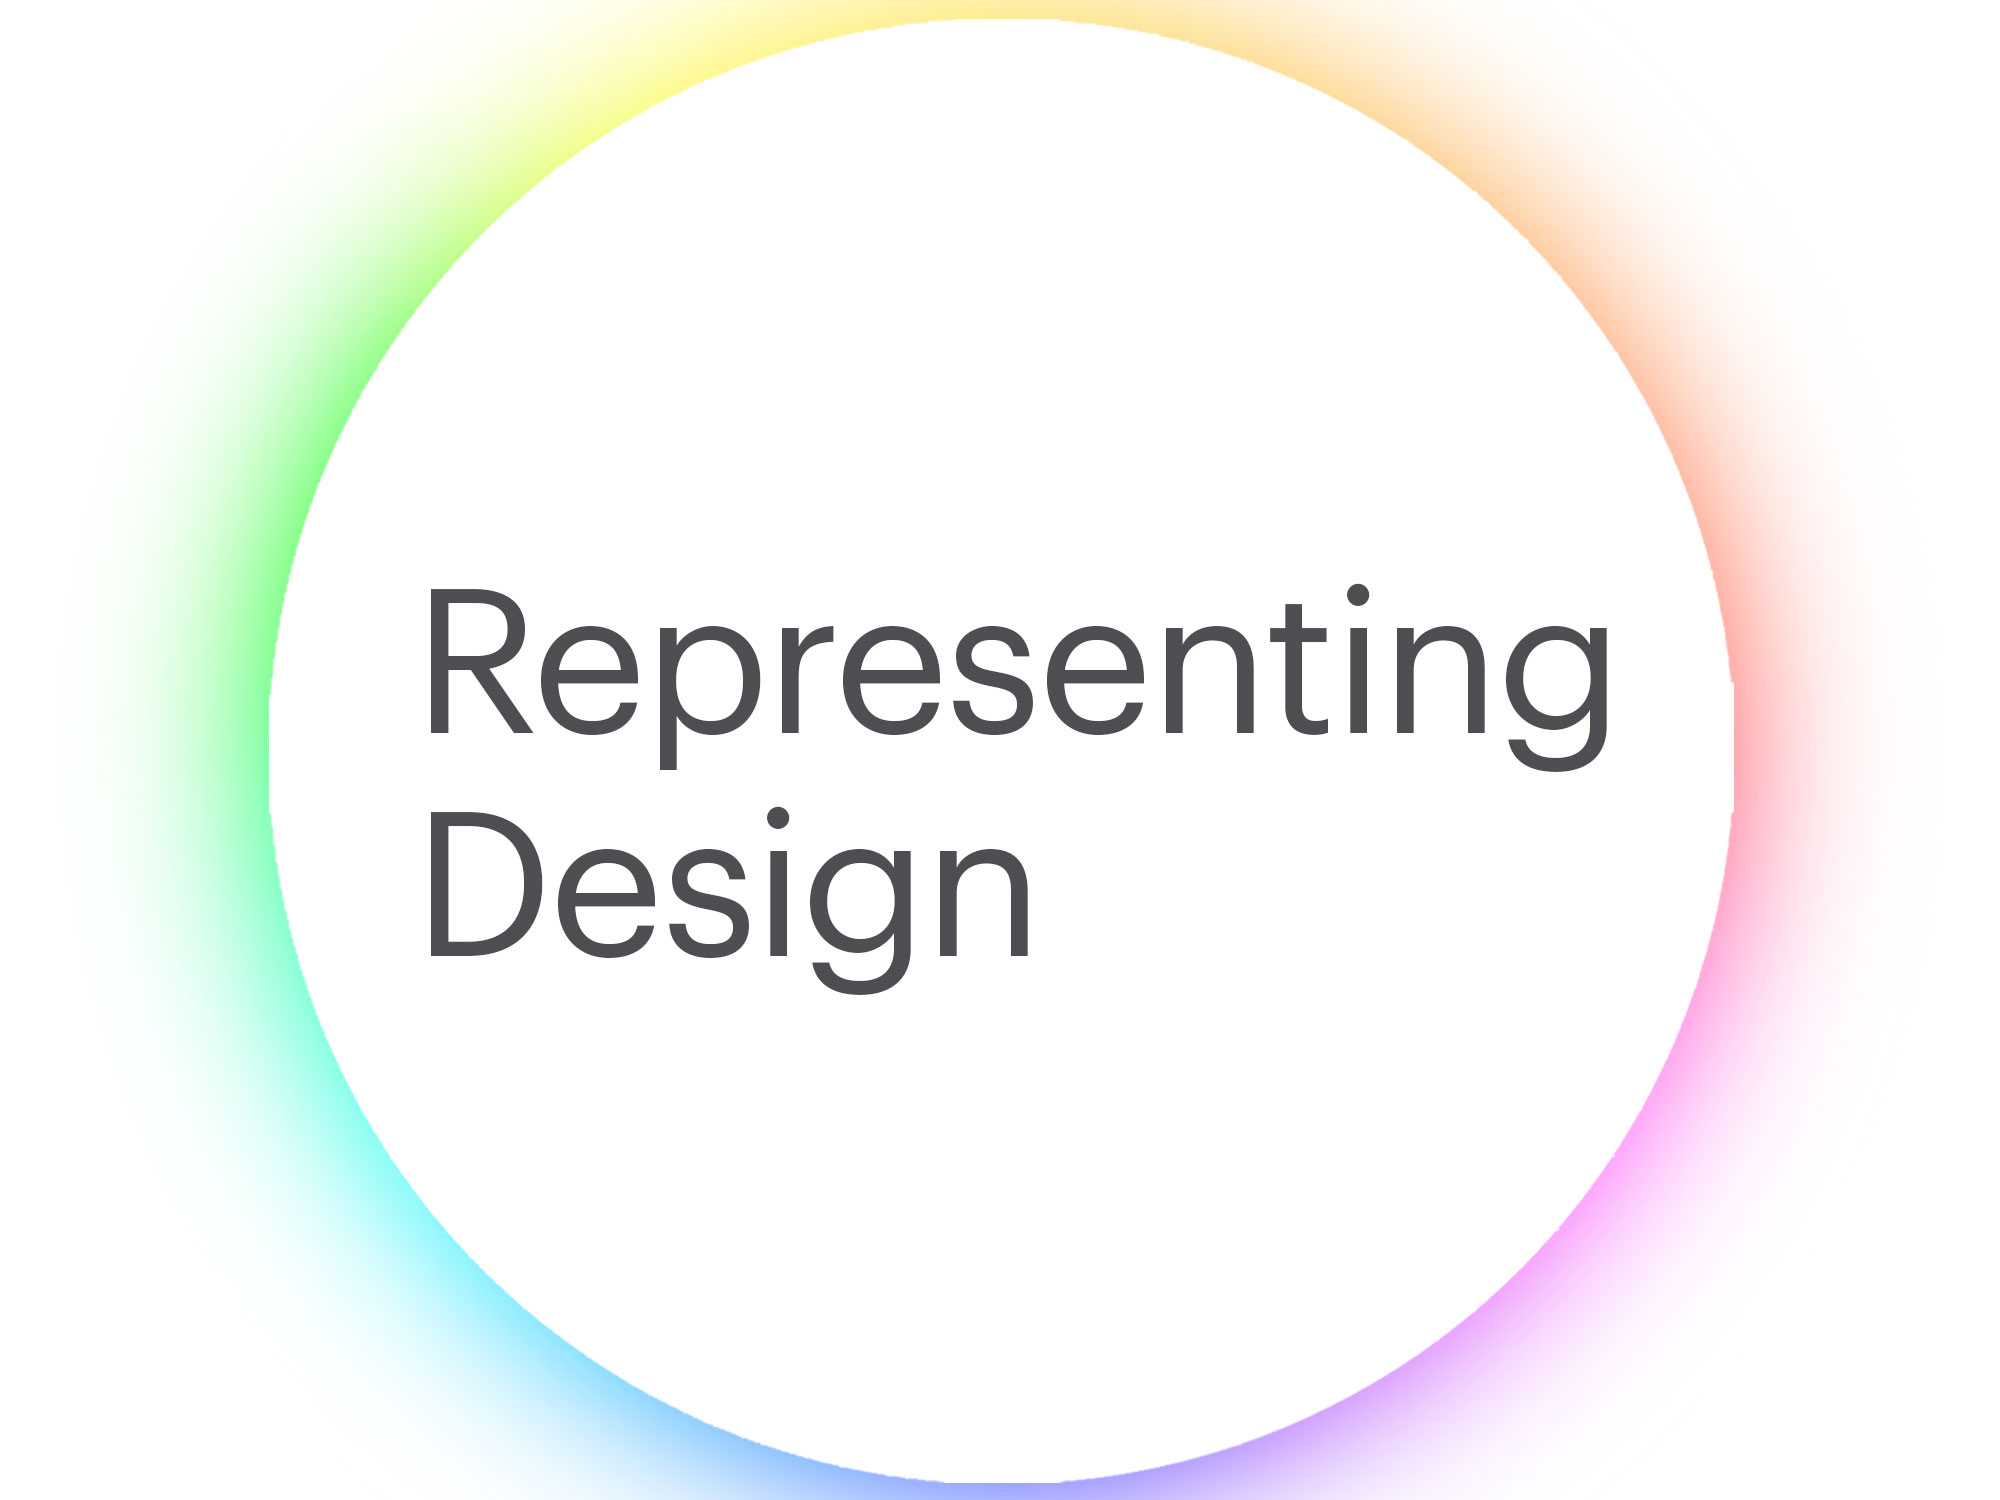 Cover image: Representing Design